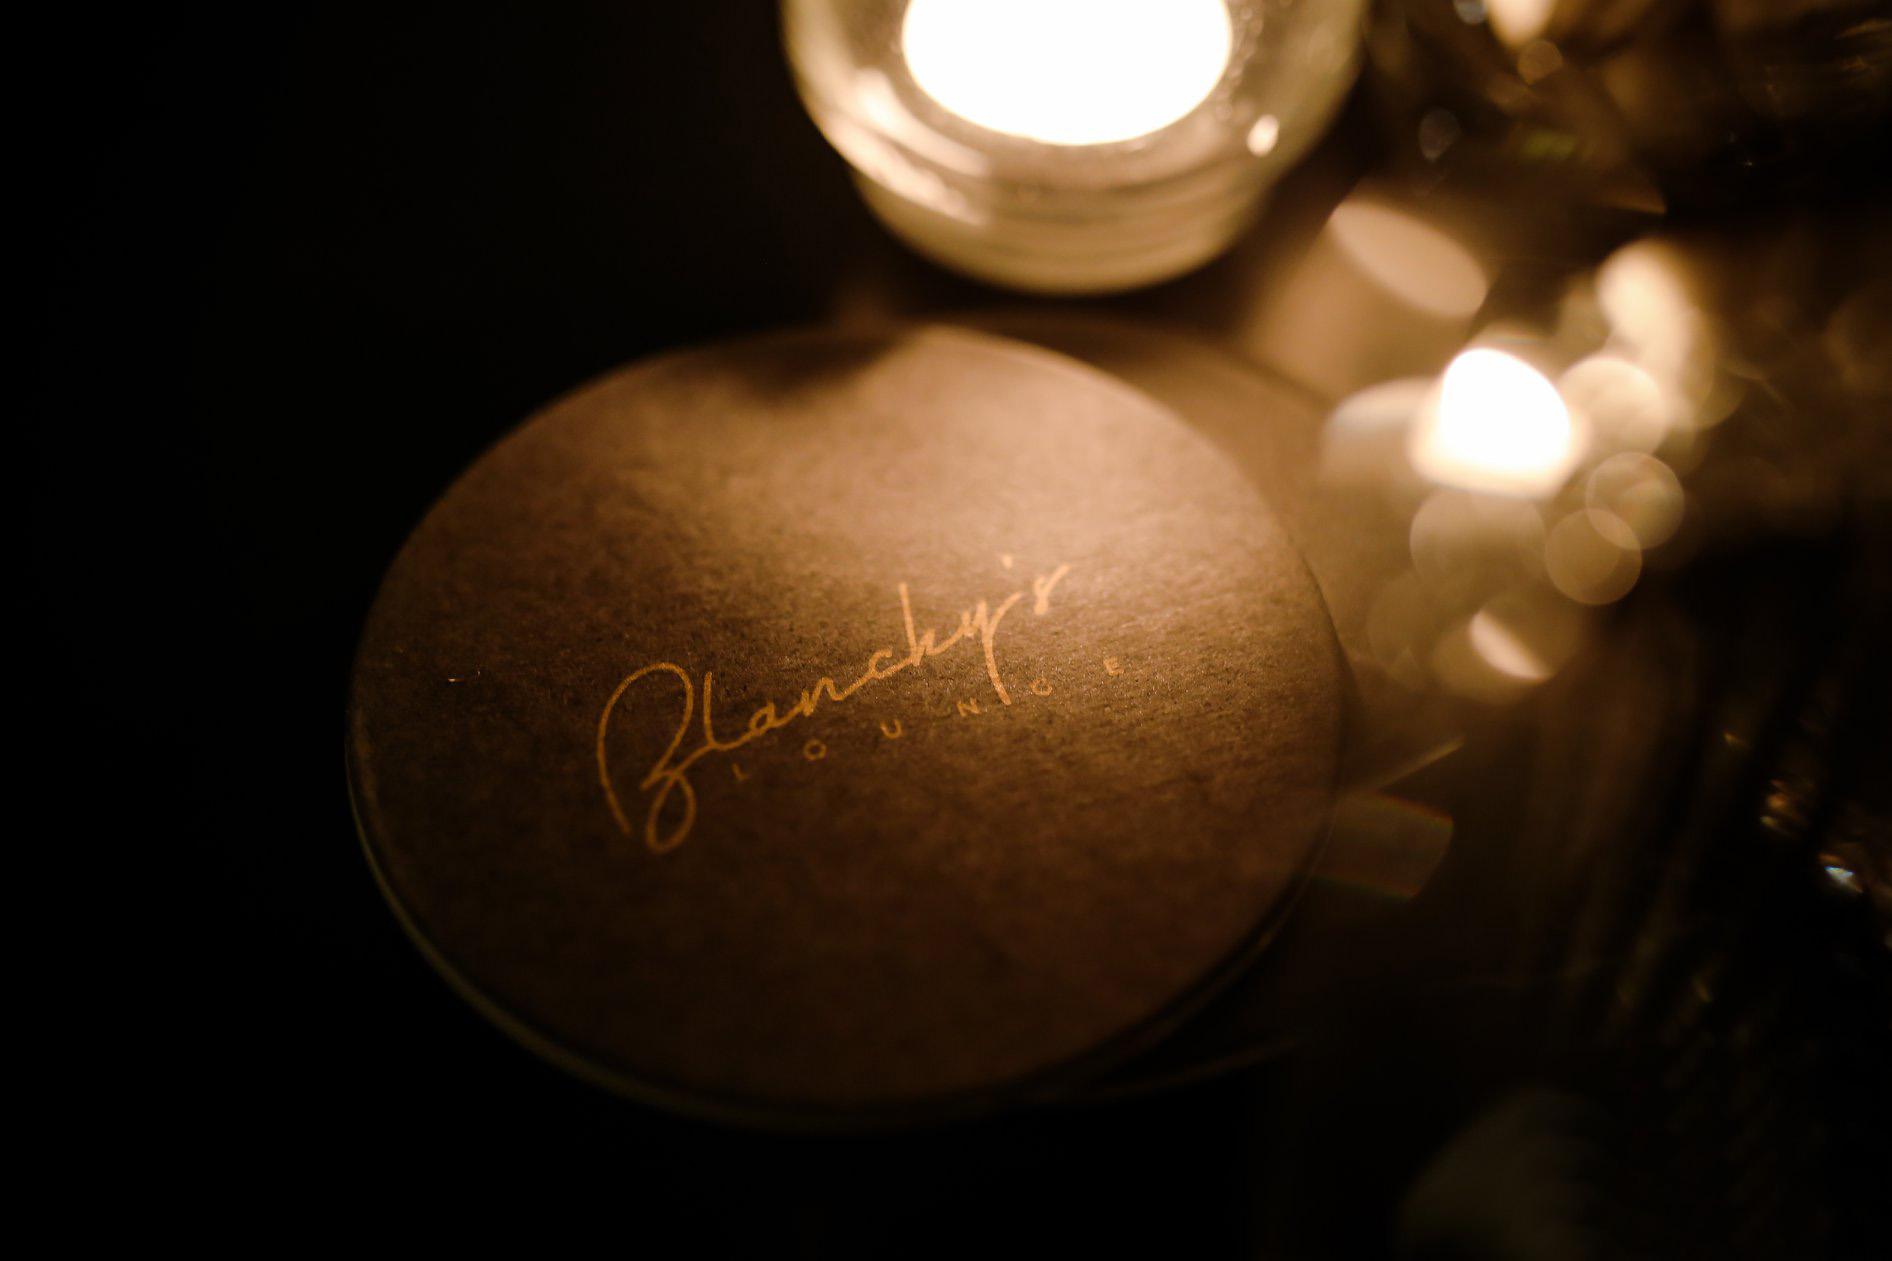 blanchy's lounge coaster, xolve branding